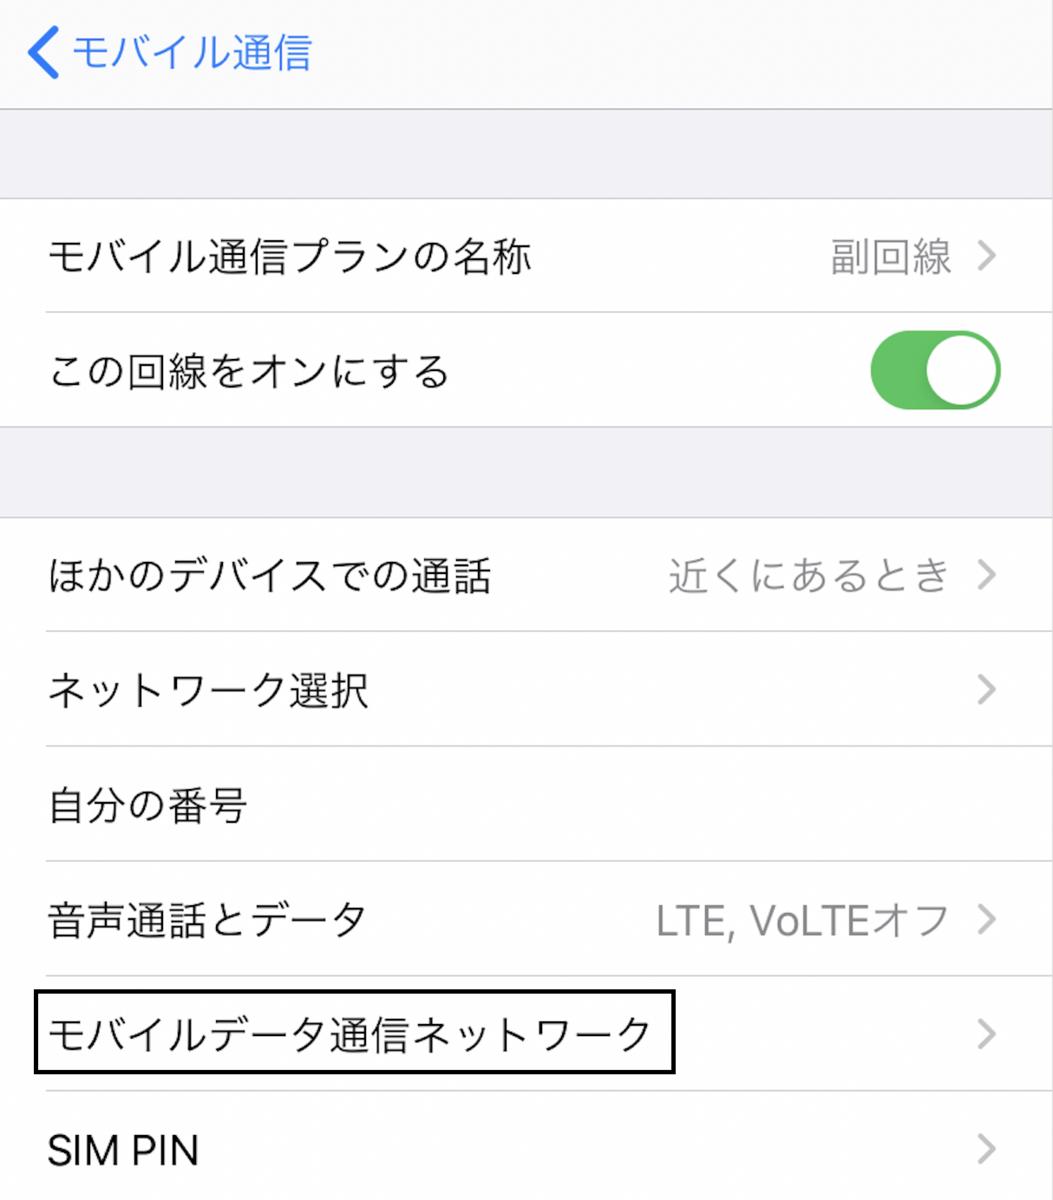 f:id:koiwai_chinatsu:20200421112407p:plain